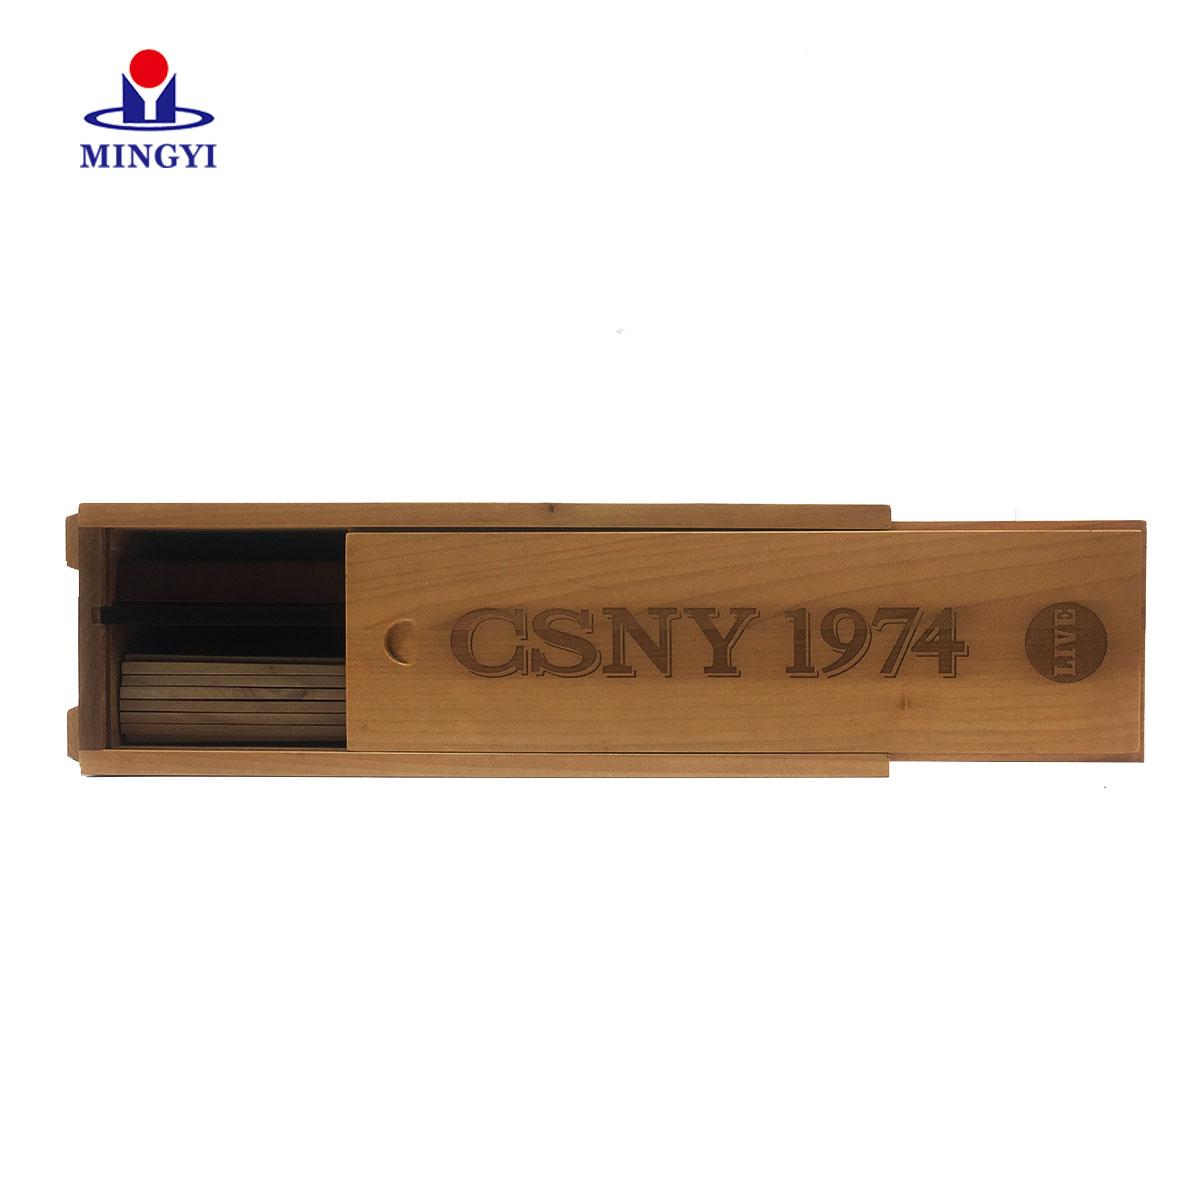 Mingyi Printing Array image91